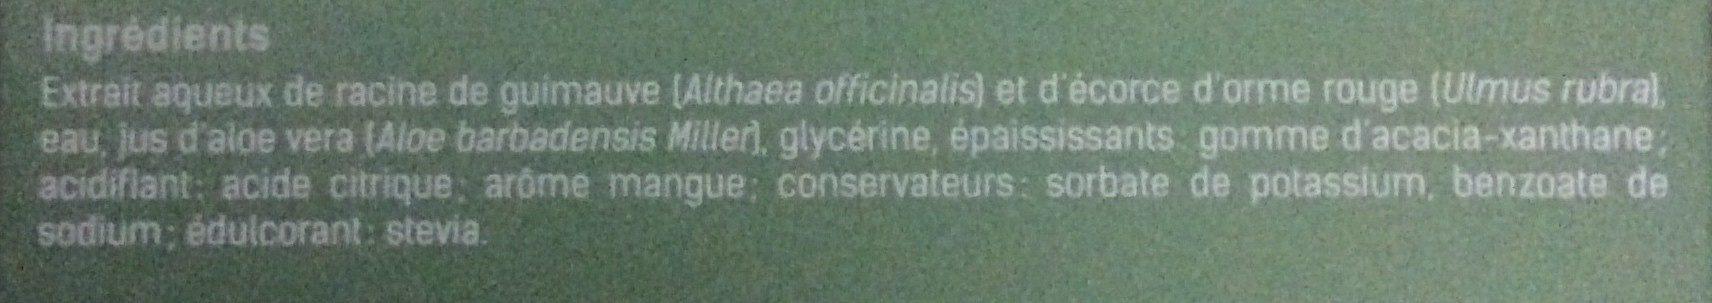 Nectaloe - Stick à boire - Ingredients - fr